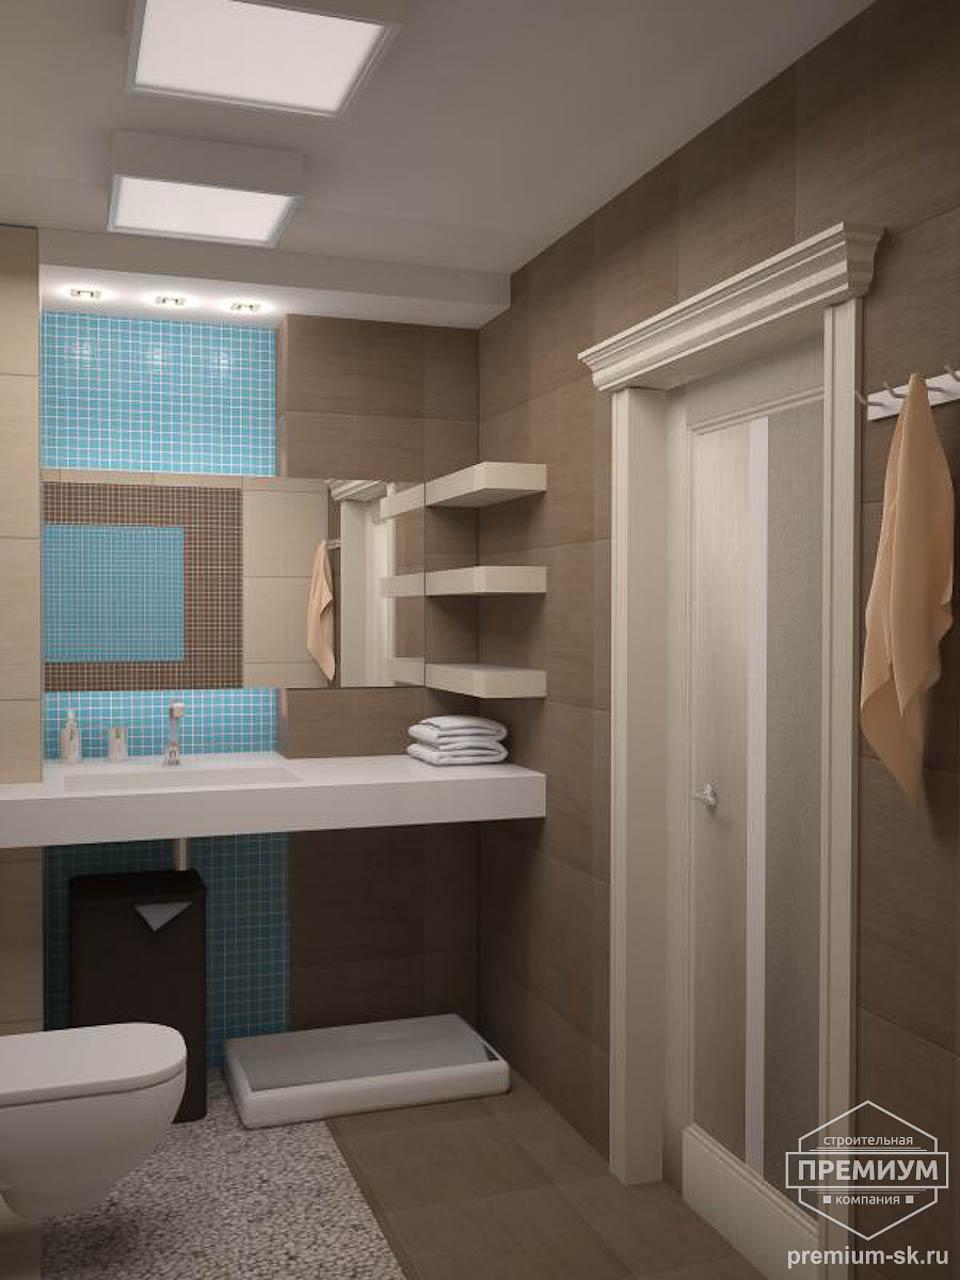 Дизайн интерьера однокомнатной квартиры по ул. Сыромолотова 11 img1744415839